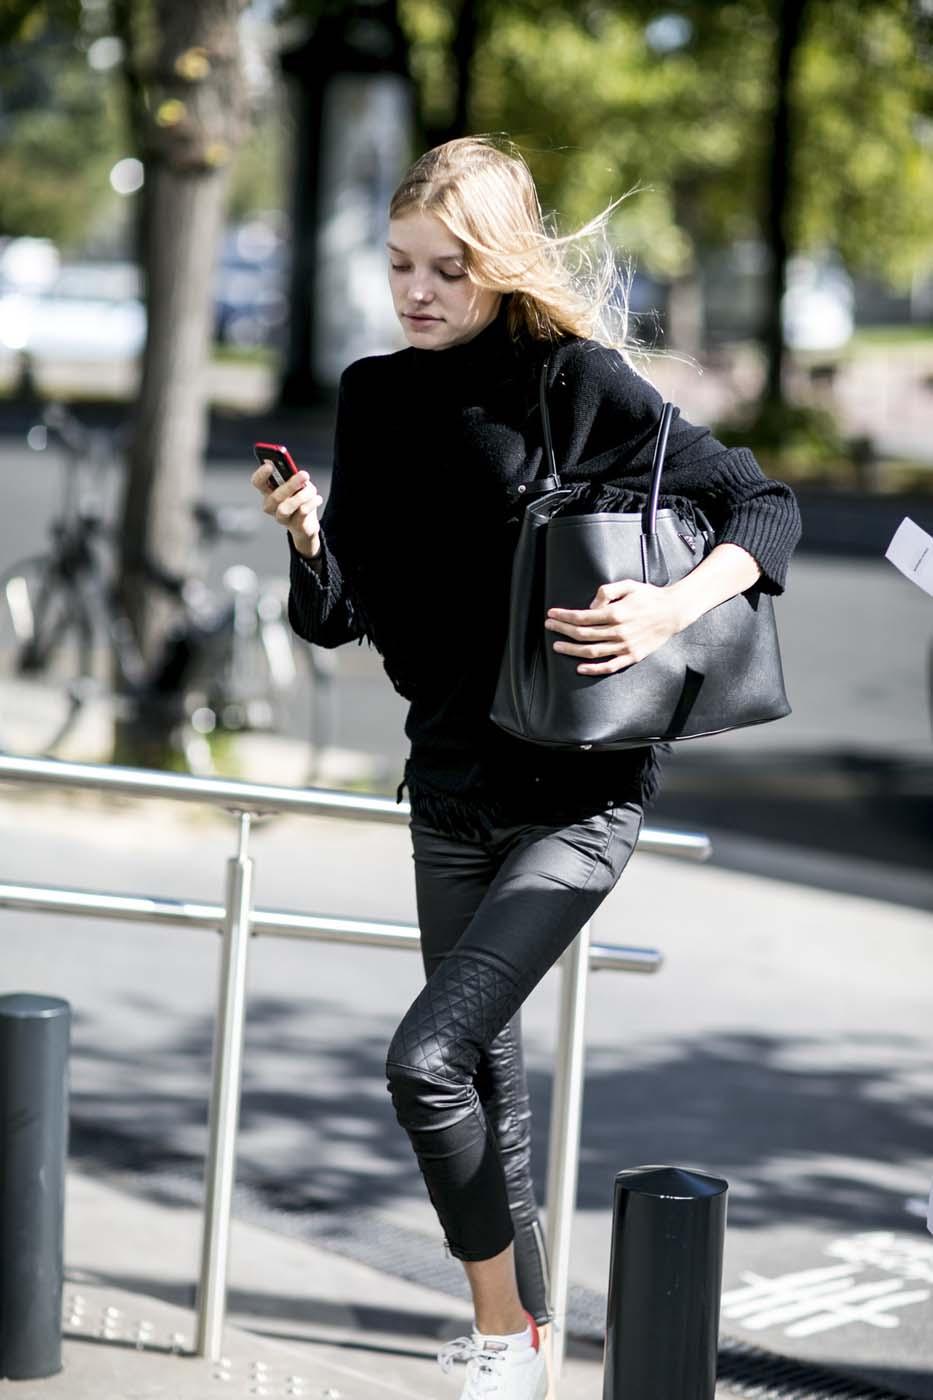 64071c15394c3 street style fashion week femme sportswear slim jeans baskets blanches